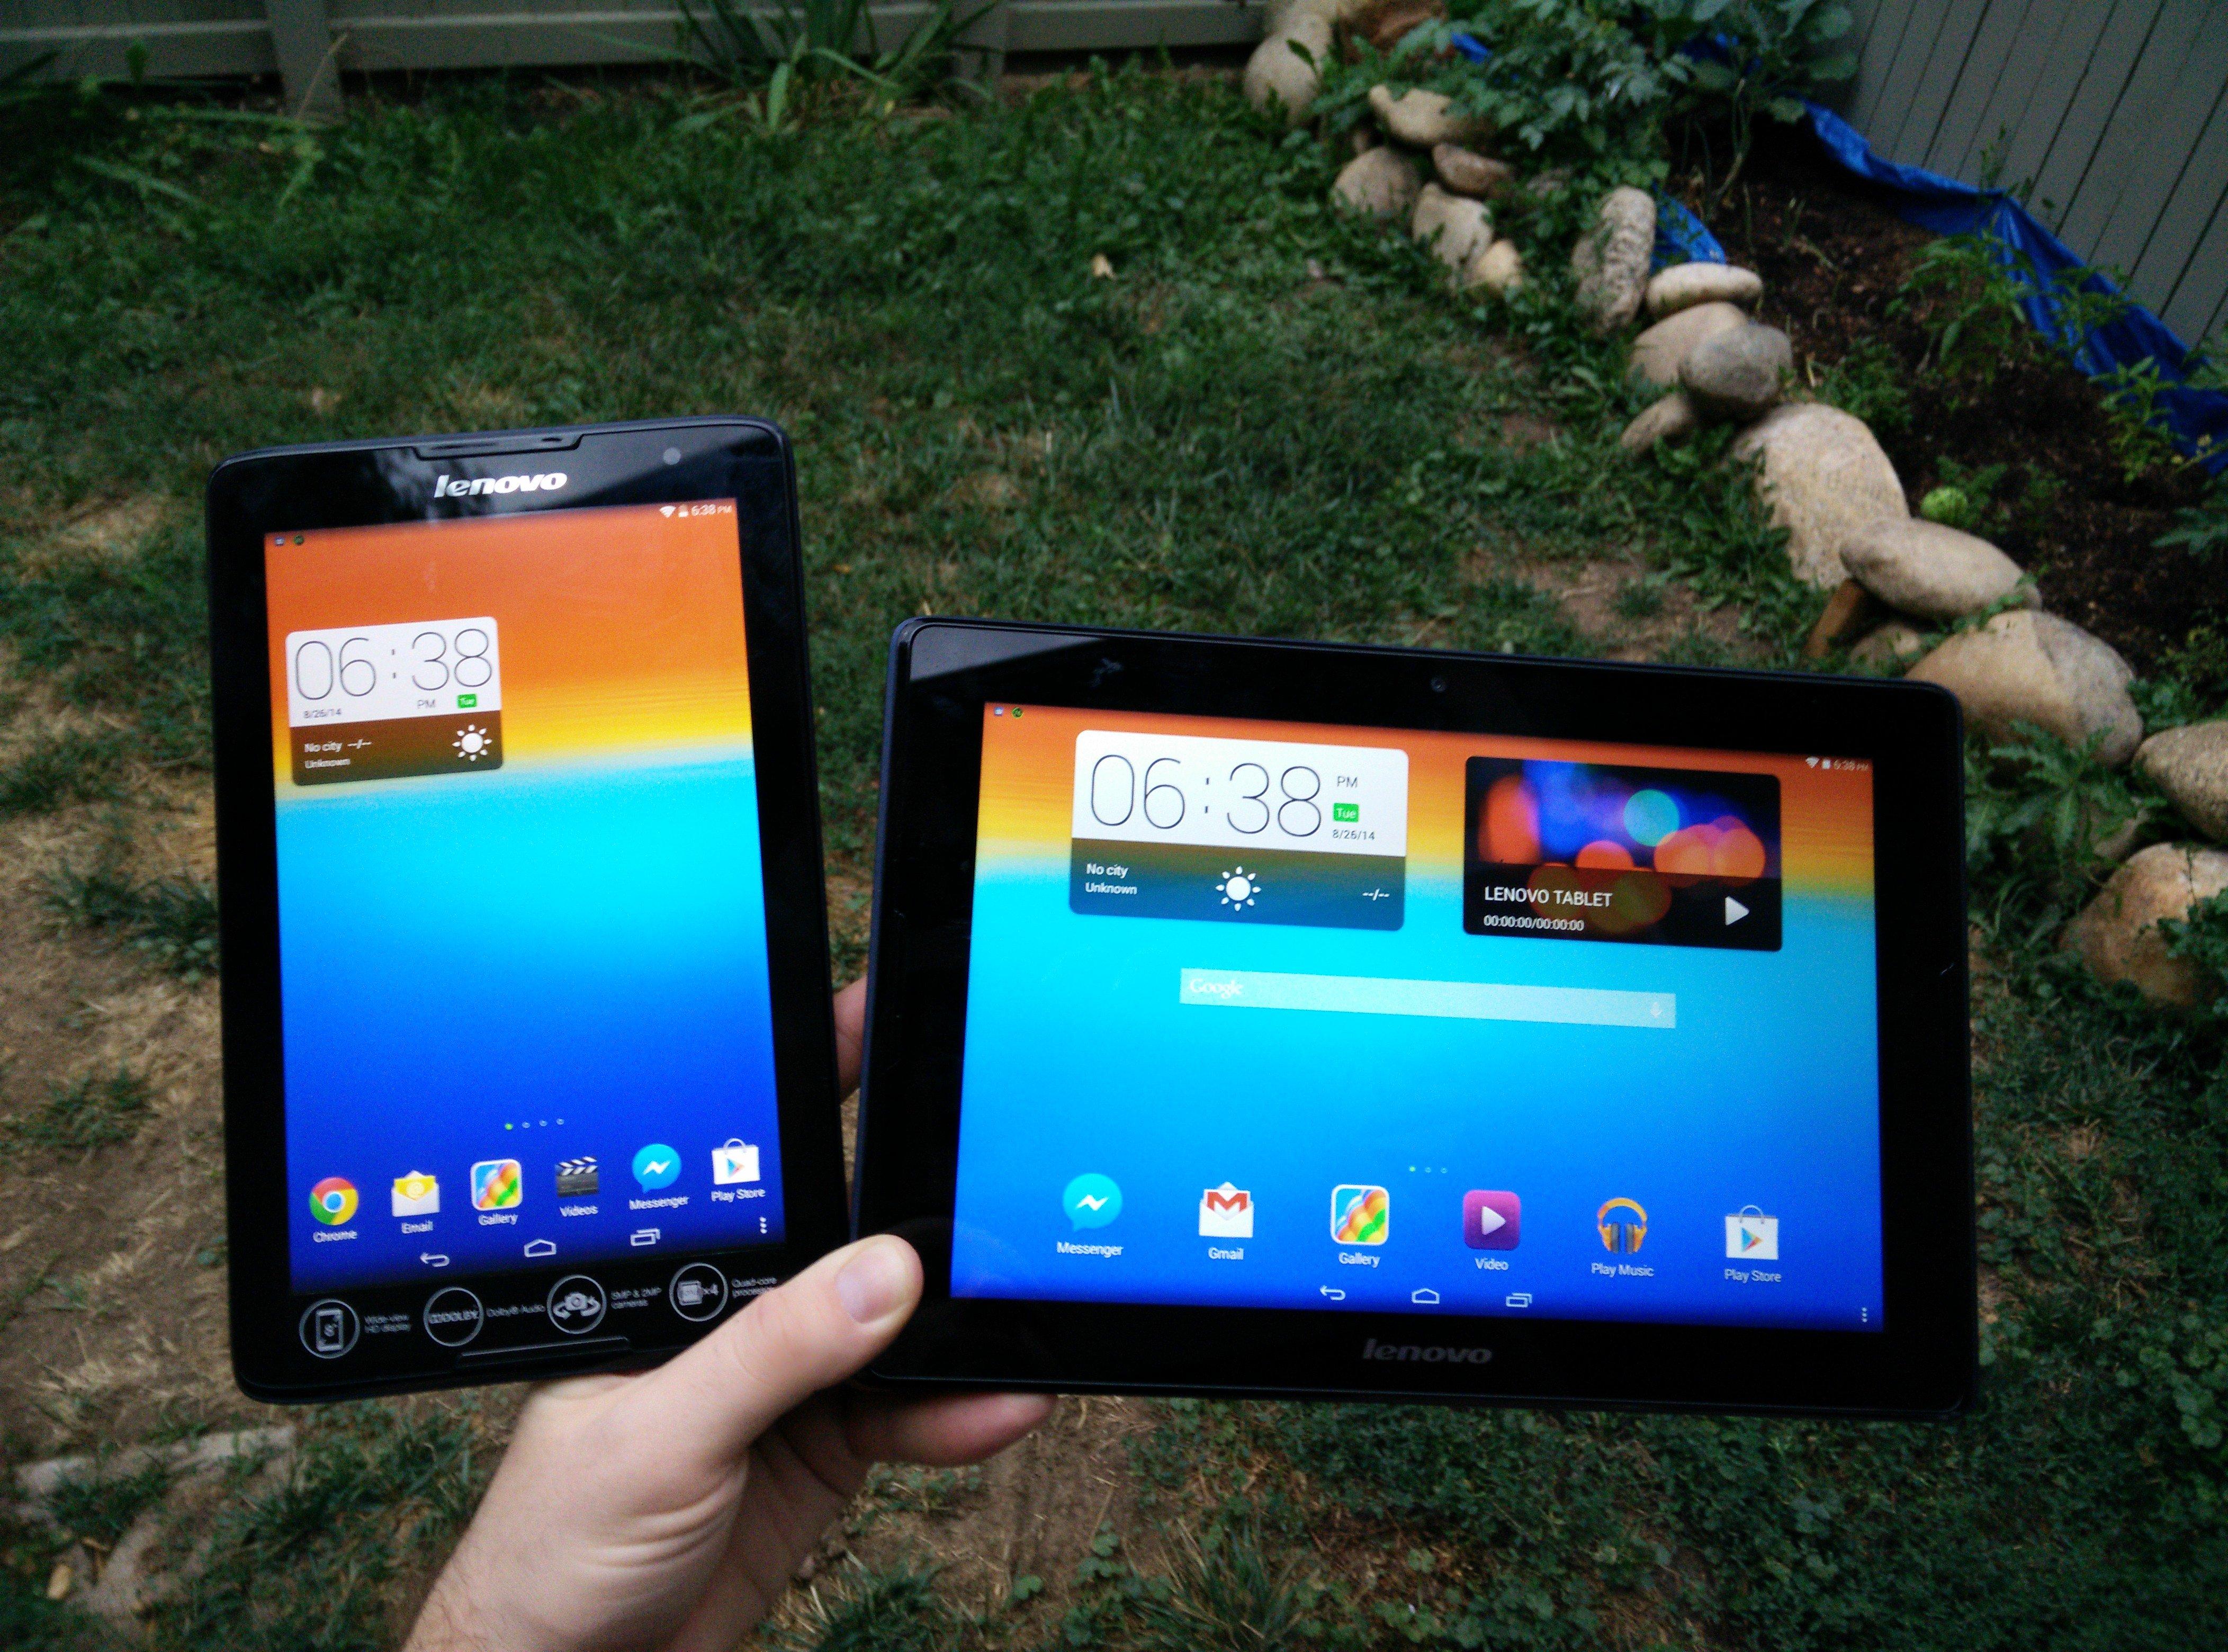 android 4 4 2 kitkat - AndroidGuys